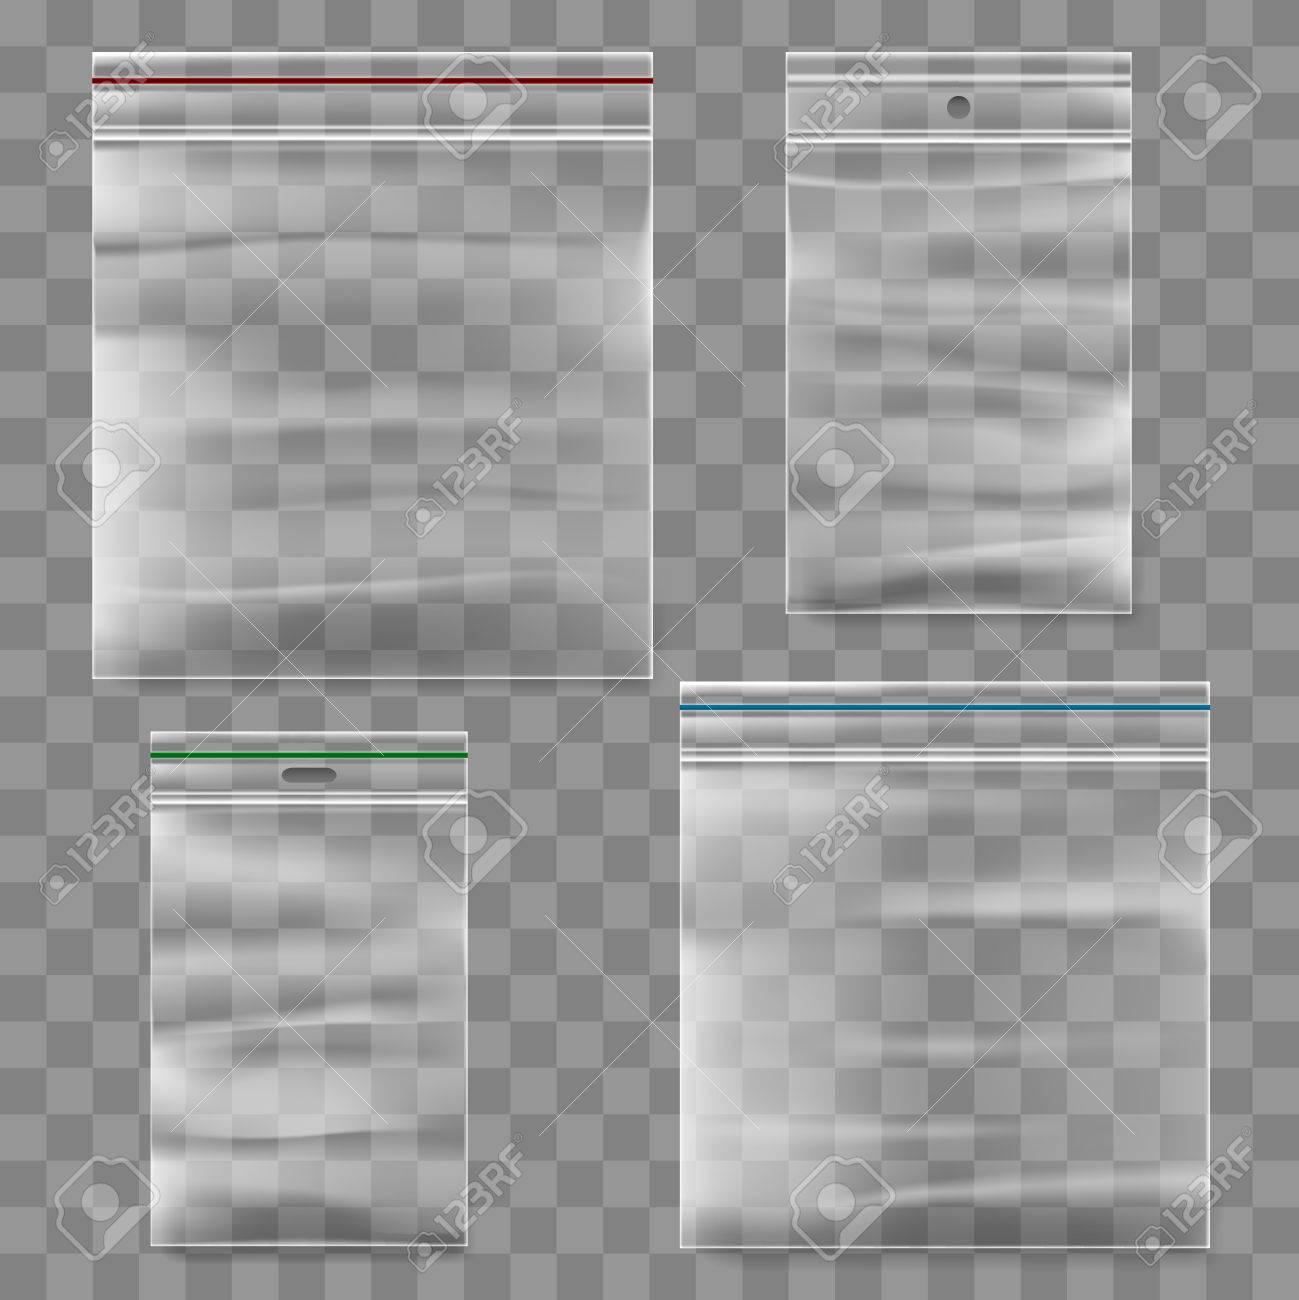 Plastic zipper bag template. Transparent ziplock bags icons. - 56991648